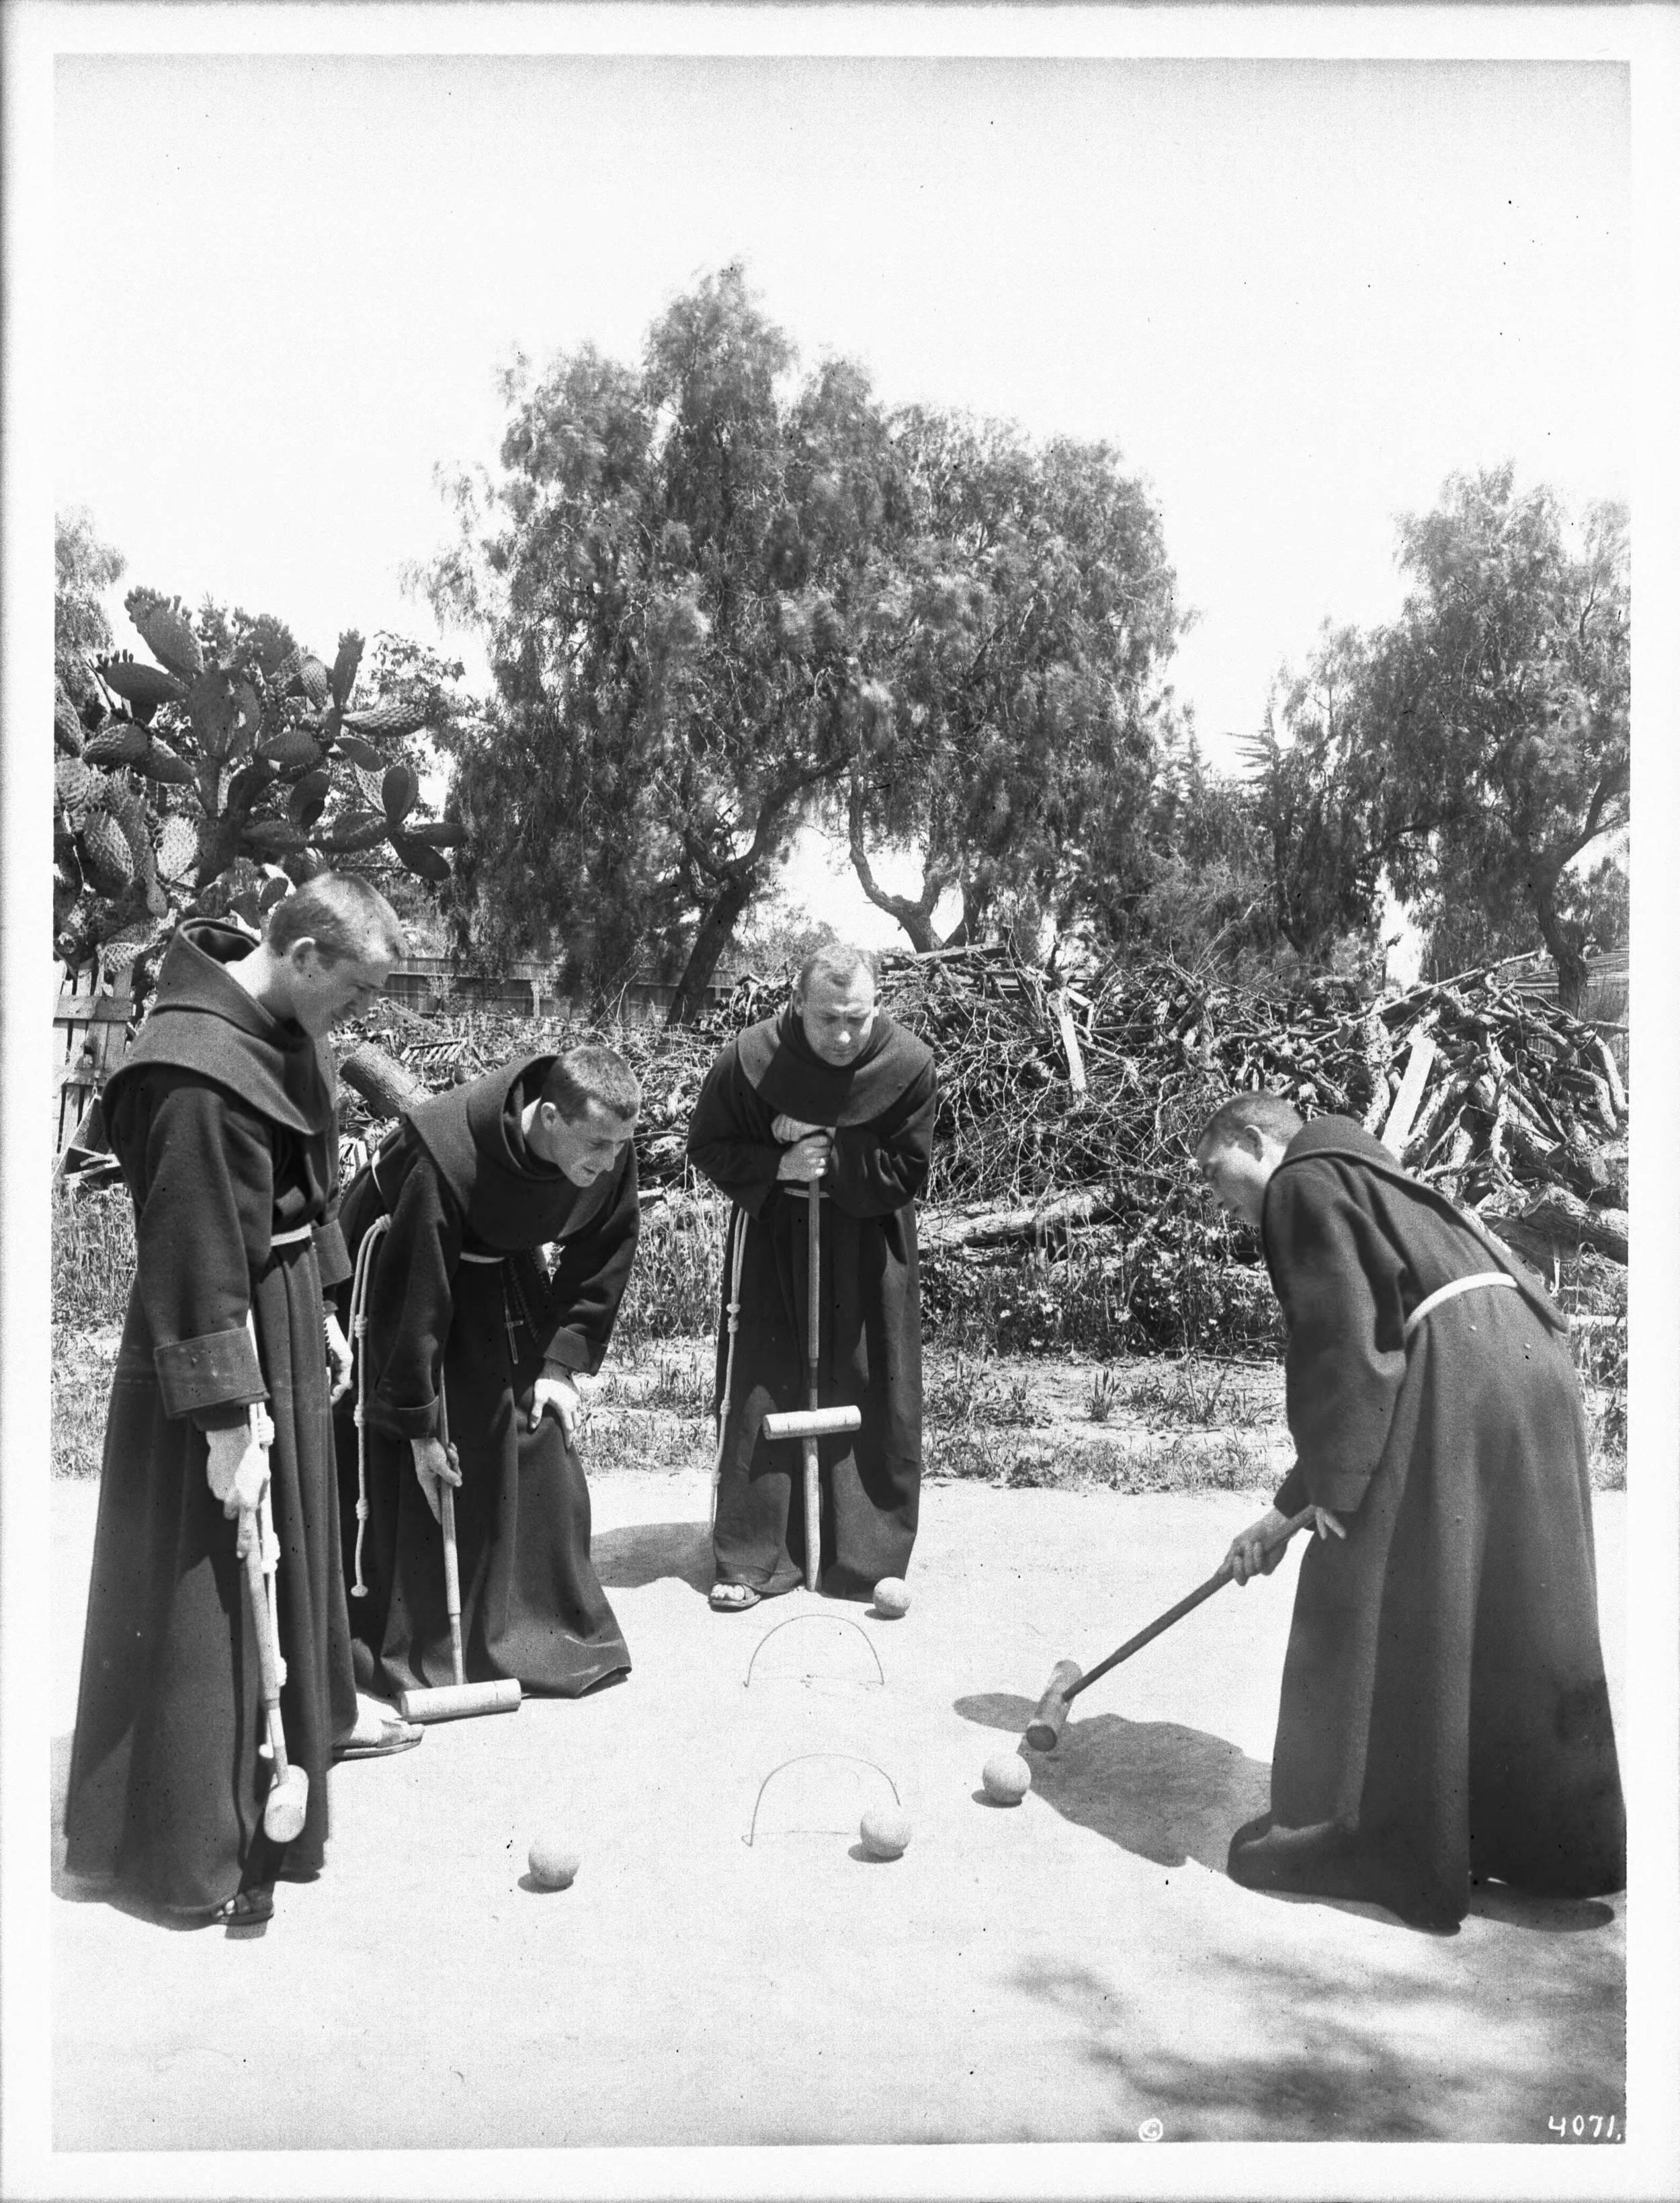 Four_Franciscan_monks_playing_croquet_at_Mission_Santa_Barbara,_ca.1904_(CHS-4071).jpg